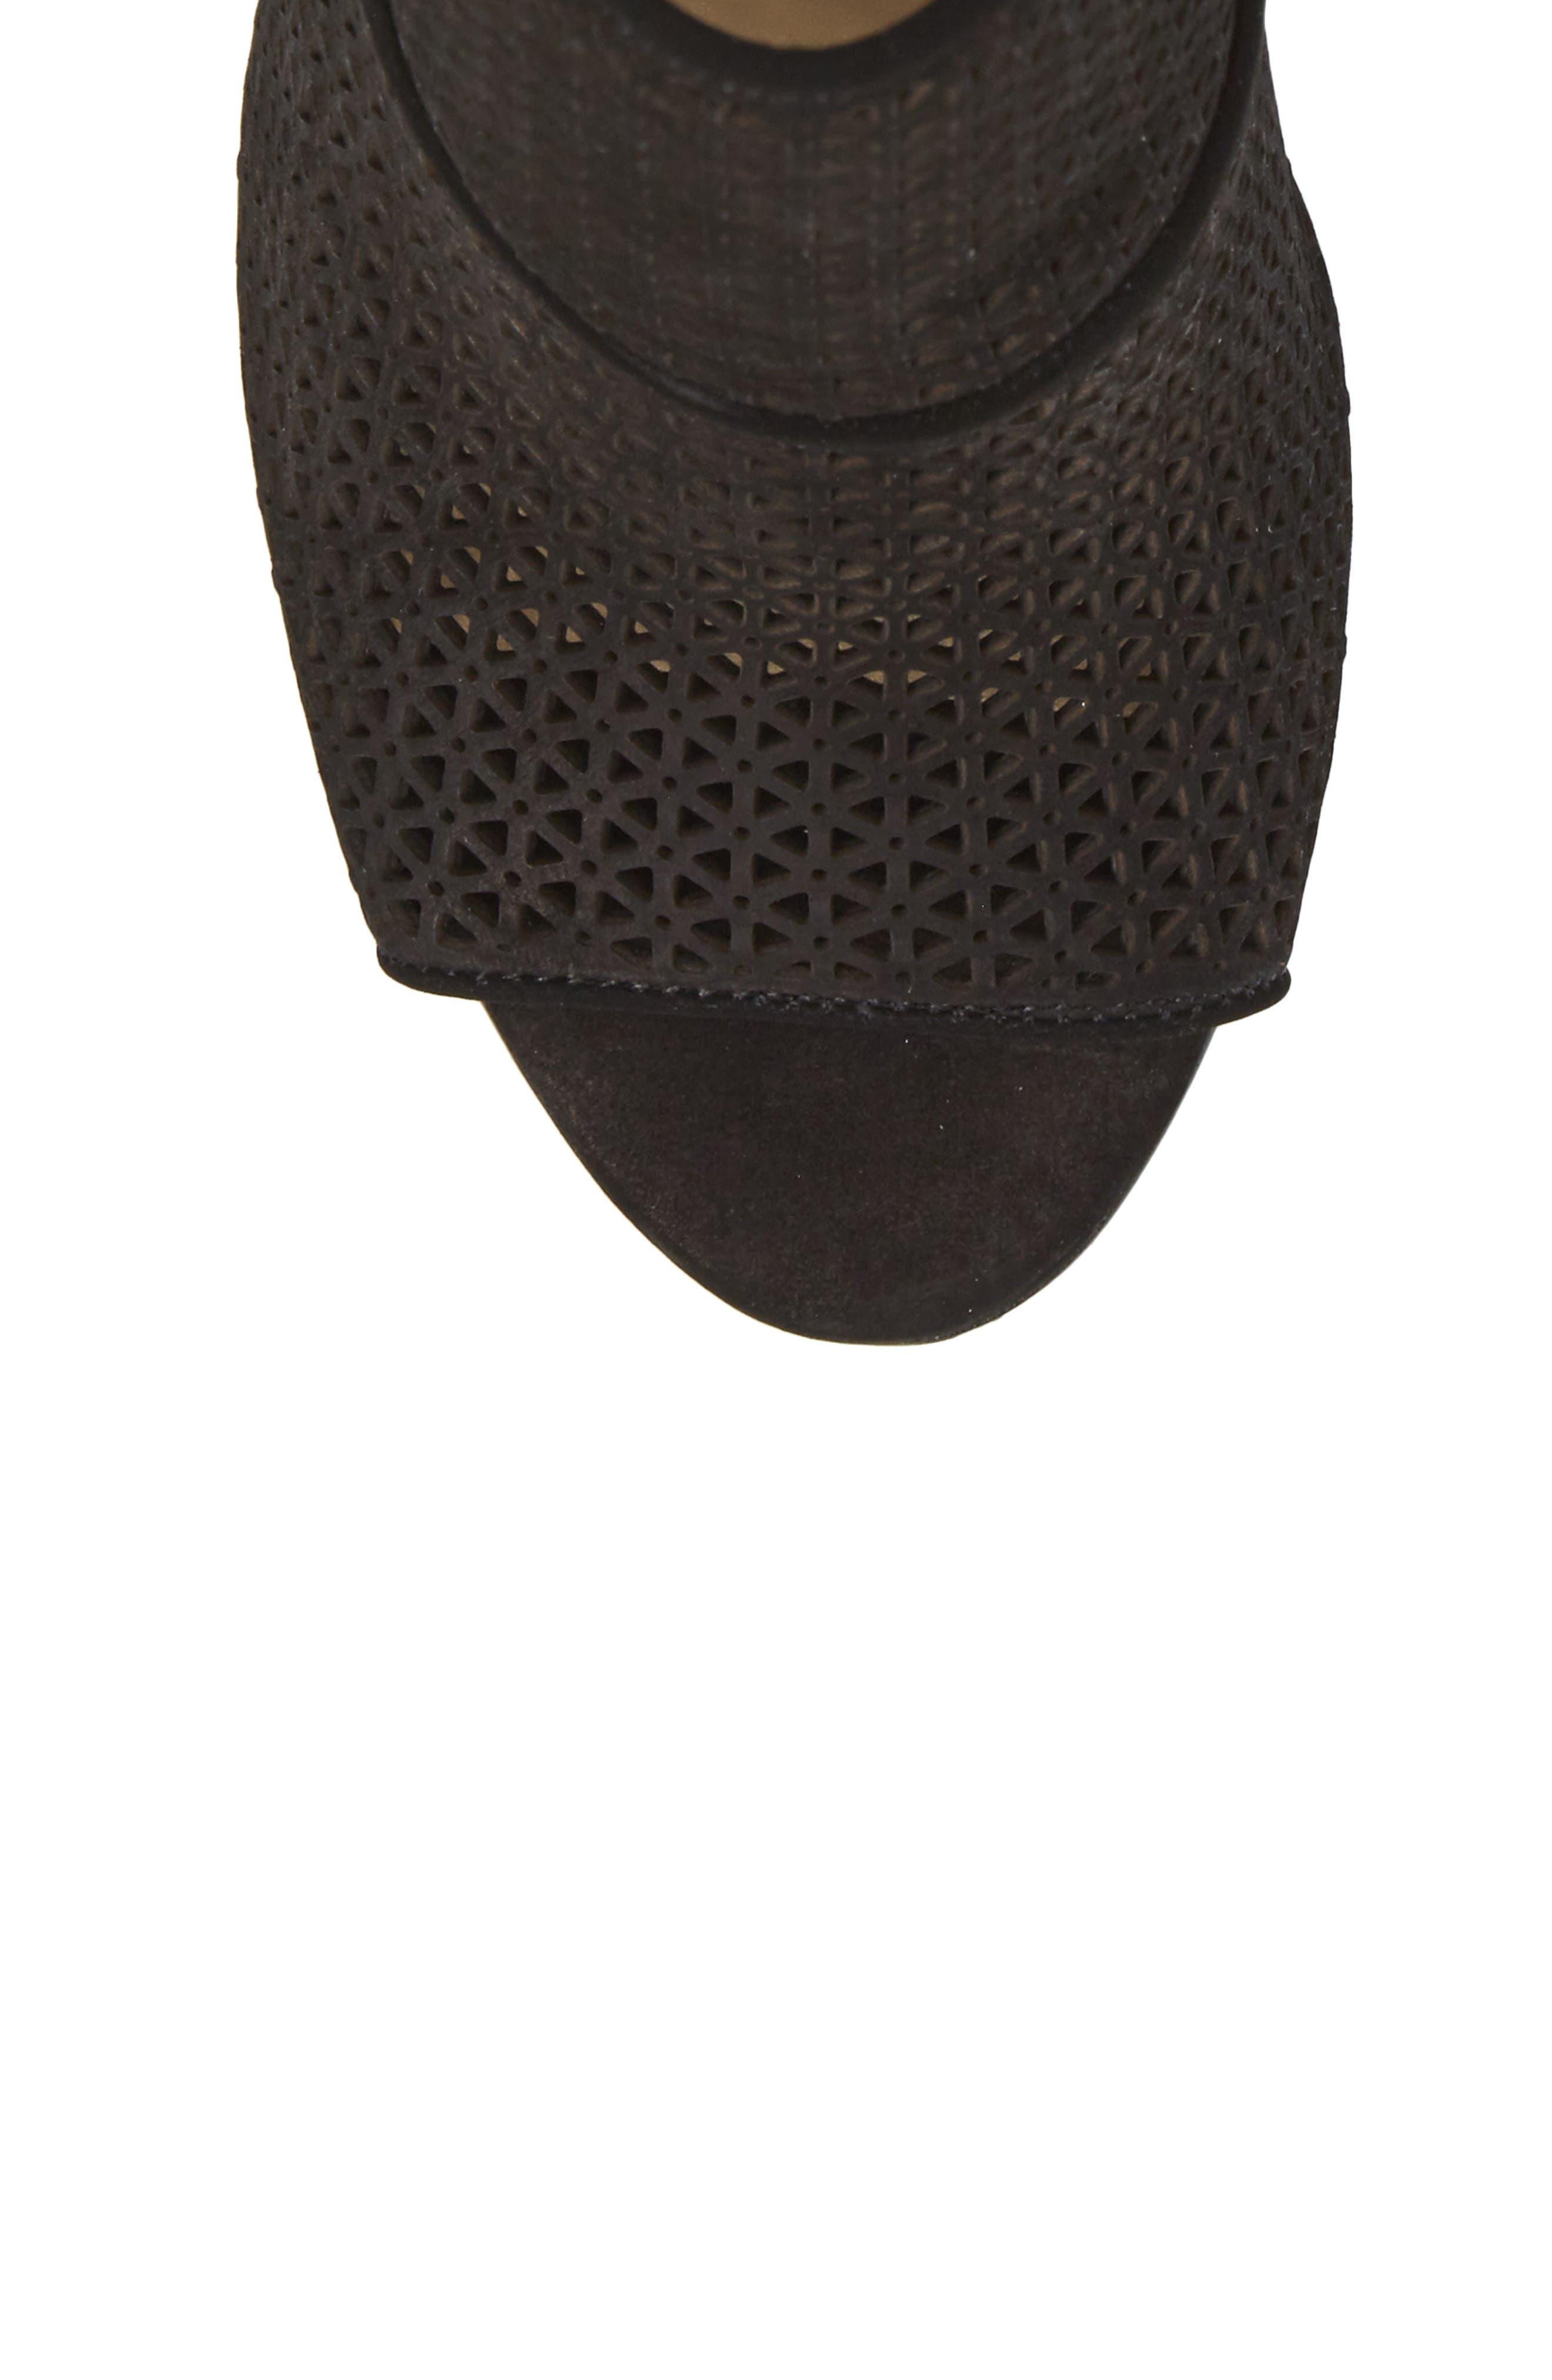 Vatena Bootie,                             Alternate thumbnail 5, color,                             Black Nubuck Leather